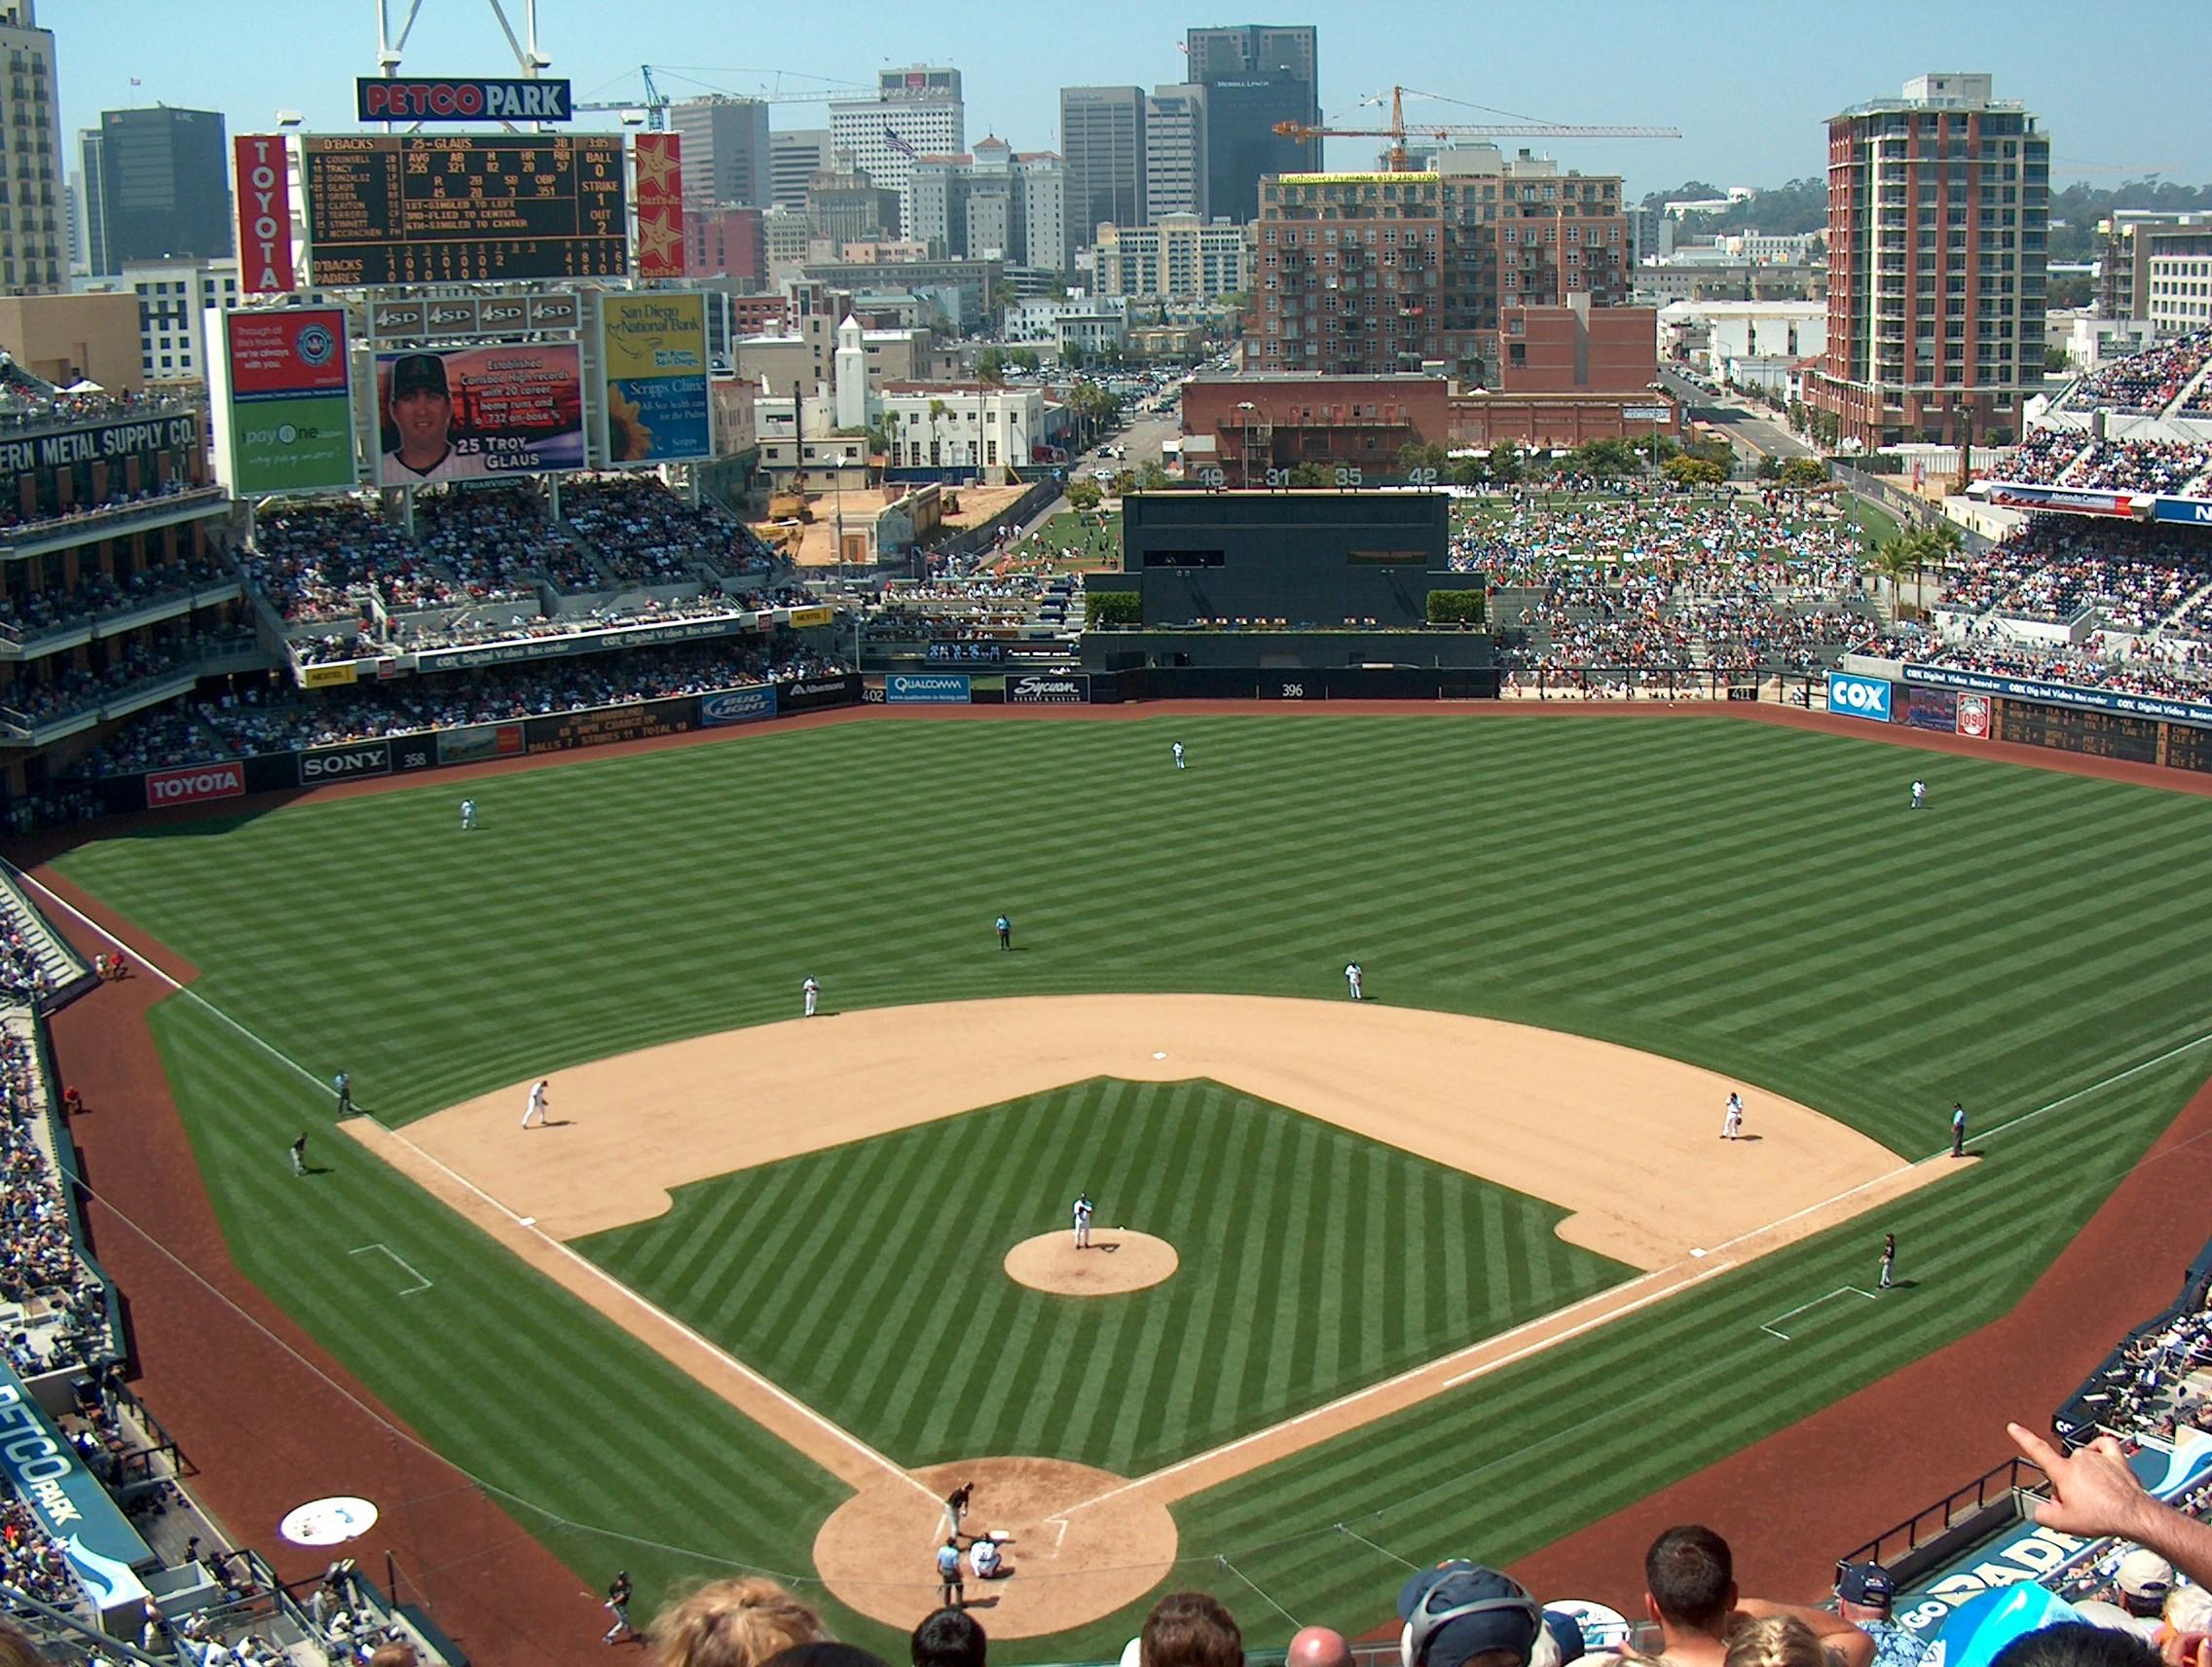 SAN DIEGO PADRES mlb baseball (6) wallpaper | | 231821 |  WallpaperUP